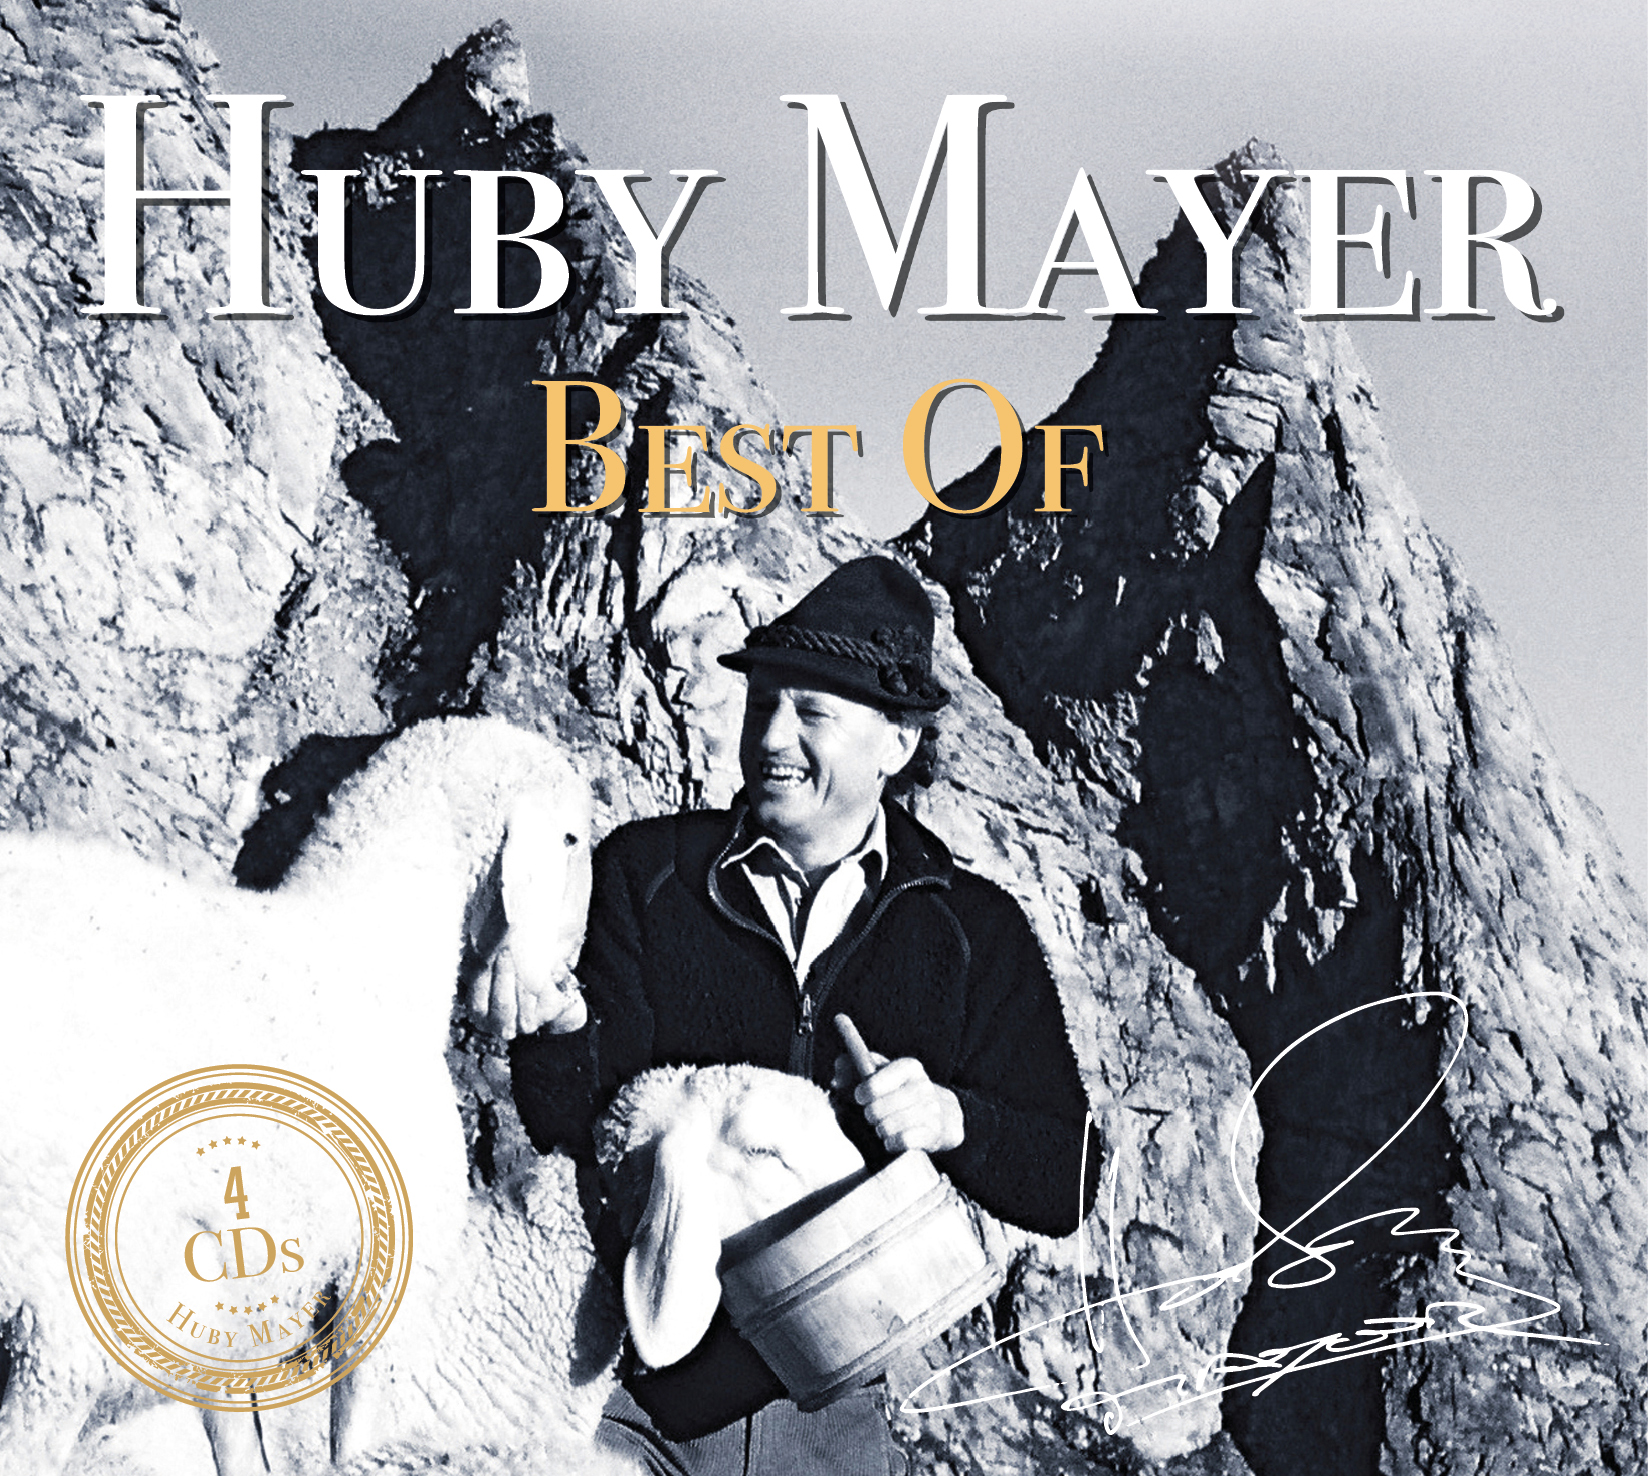 HubyMayer_CDCover_4CDs